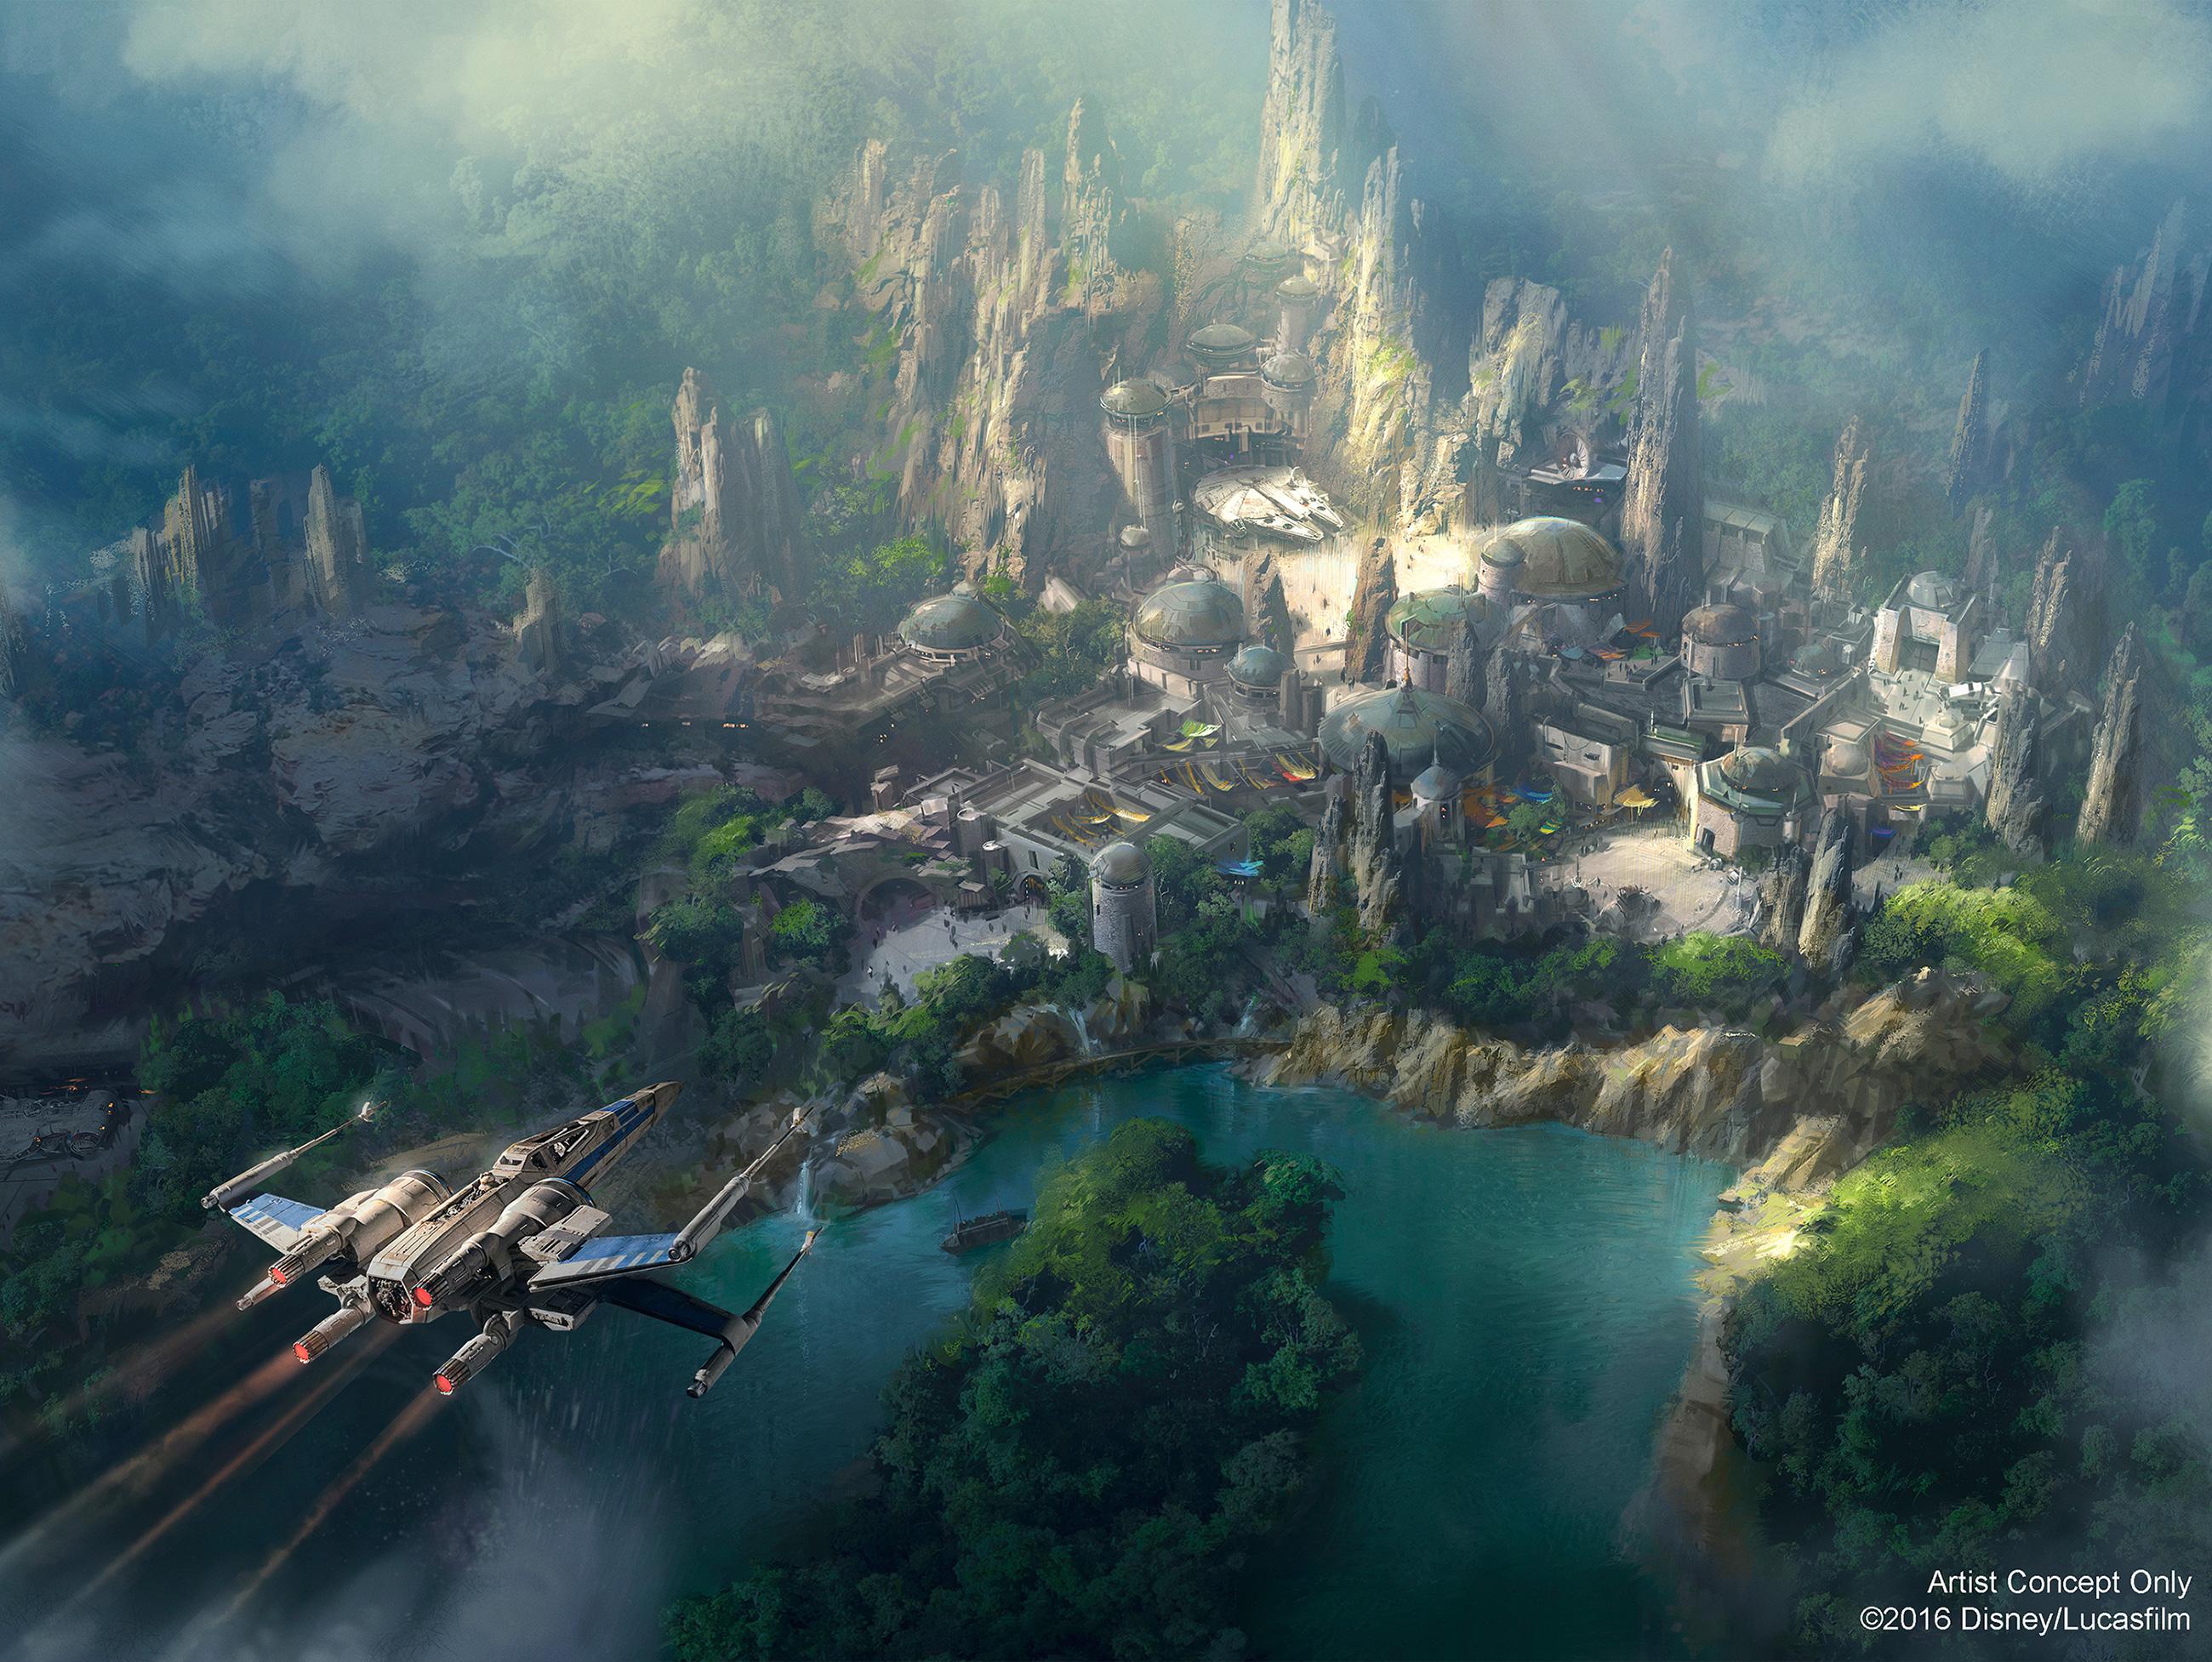 New Star Wars Land Concept Art Revealed